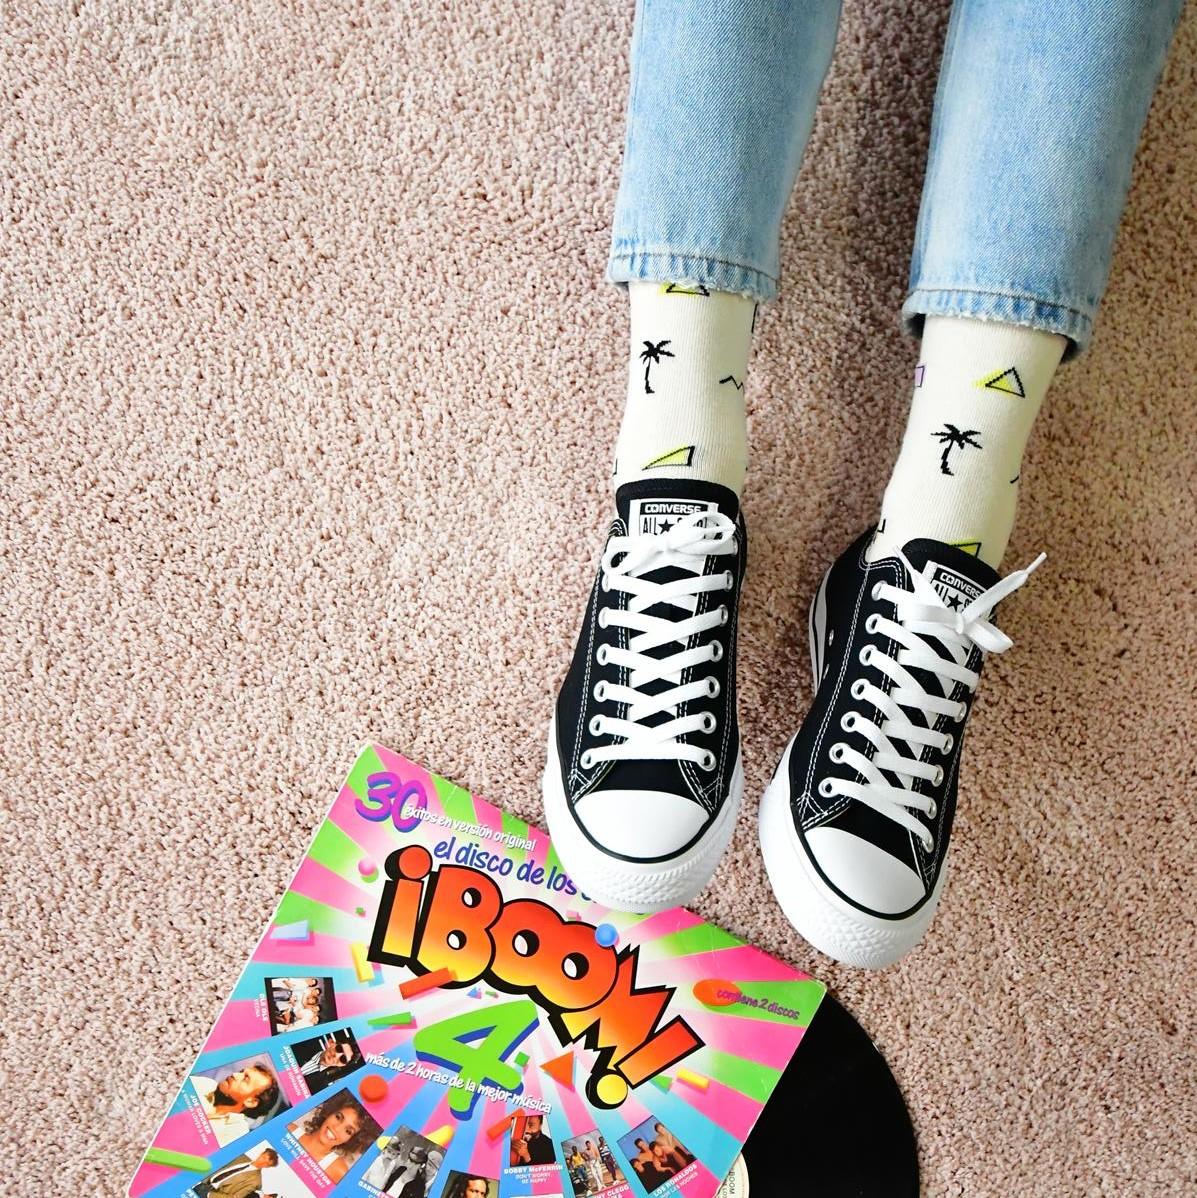 amorsocks-calcetines-socks-miami-palm-palmbeach-beige-palmeras-90s-series-limitadas